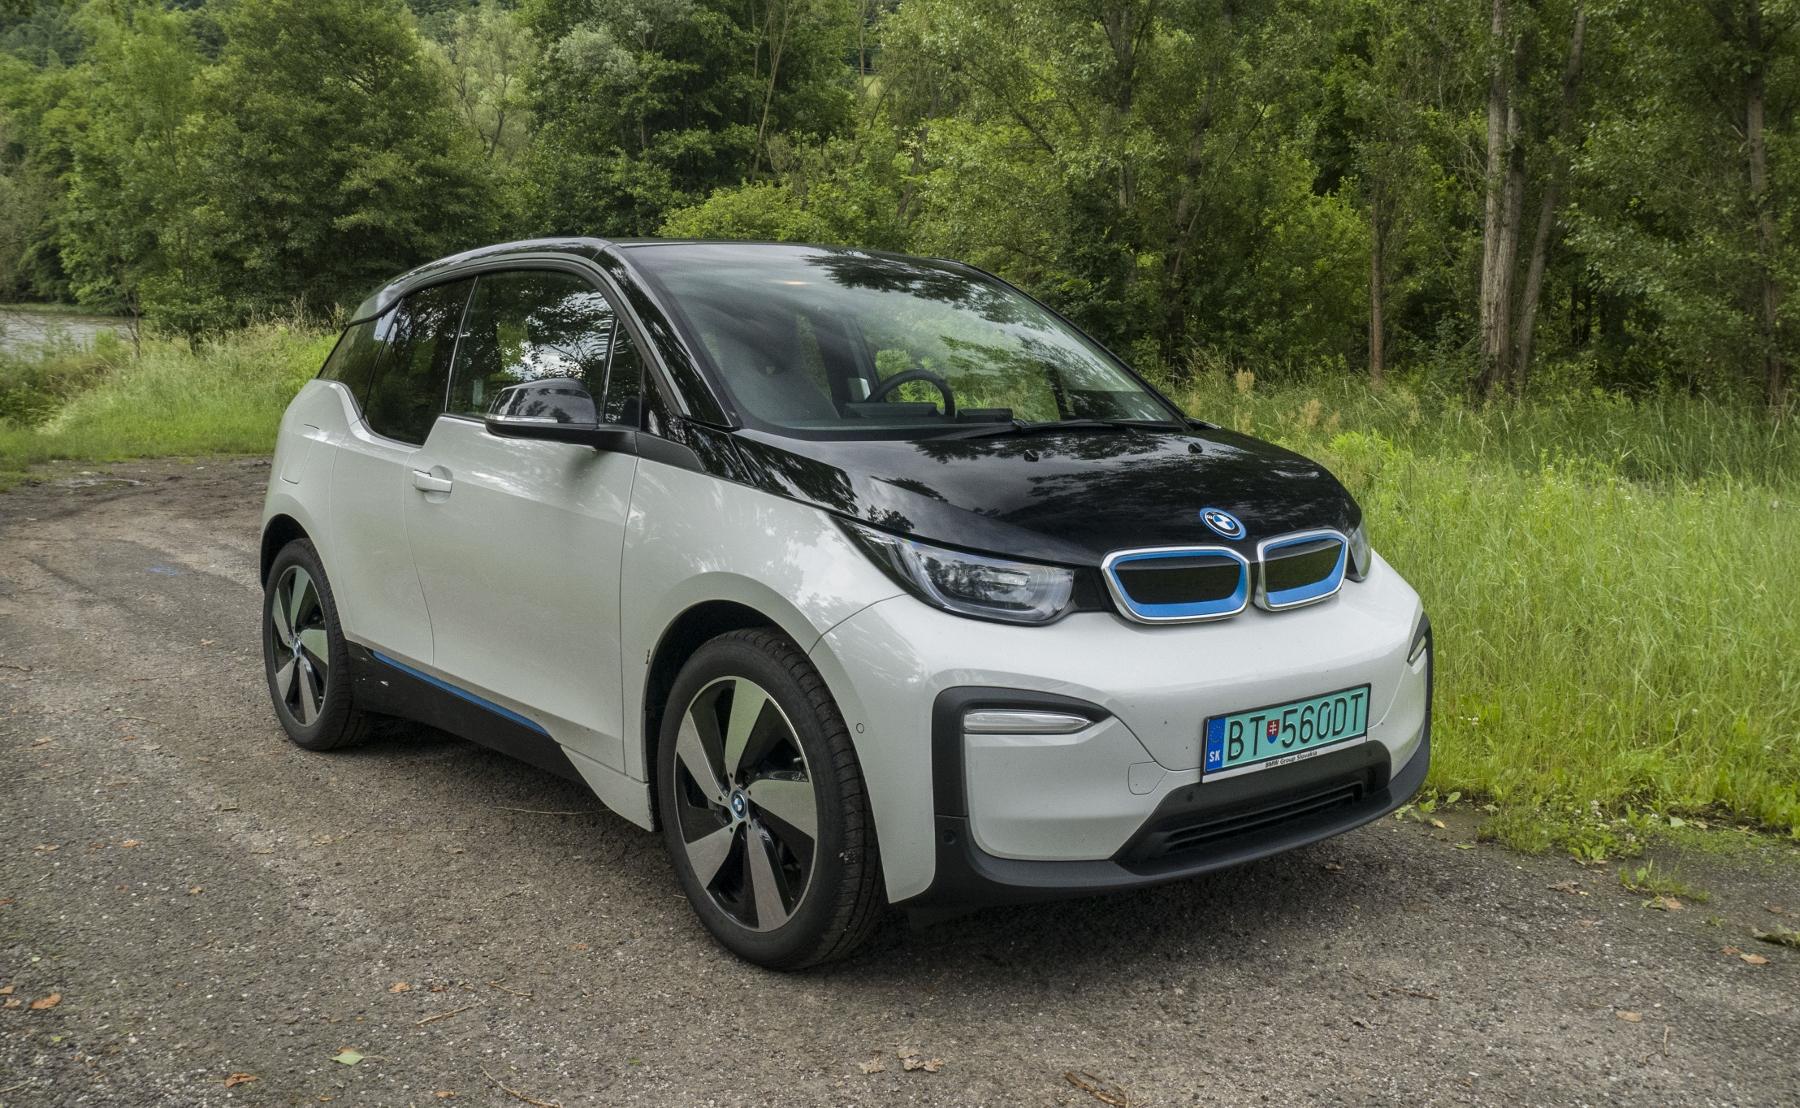 Test BMW i3: Aký je dnes na Slovensku život s elektromobilom?